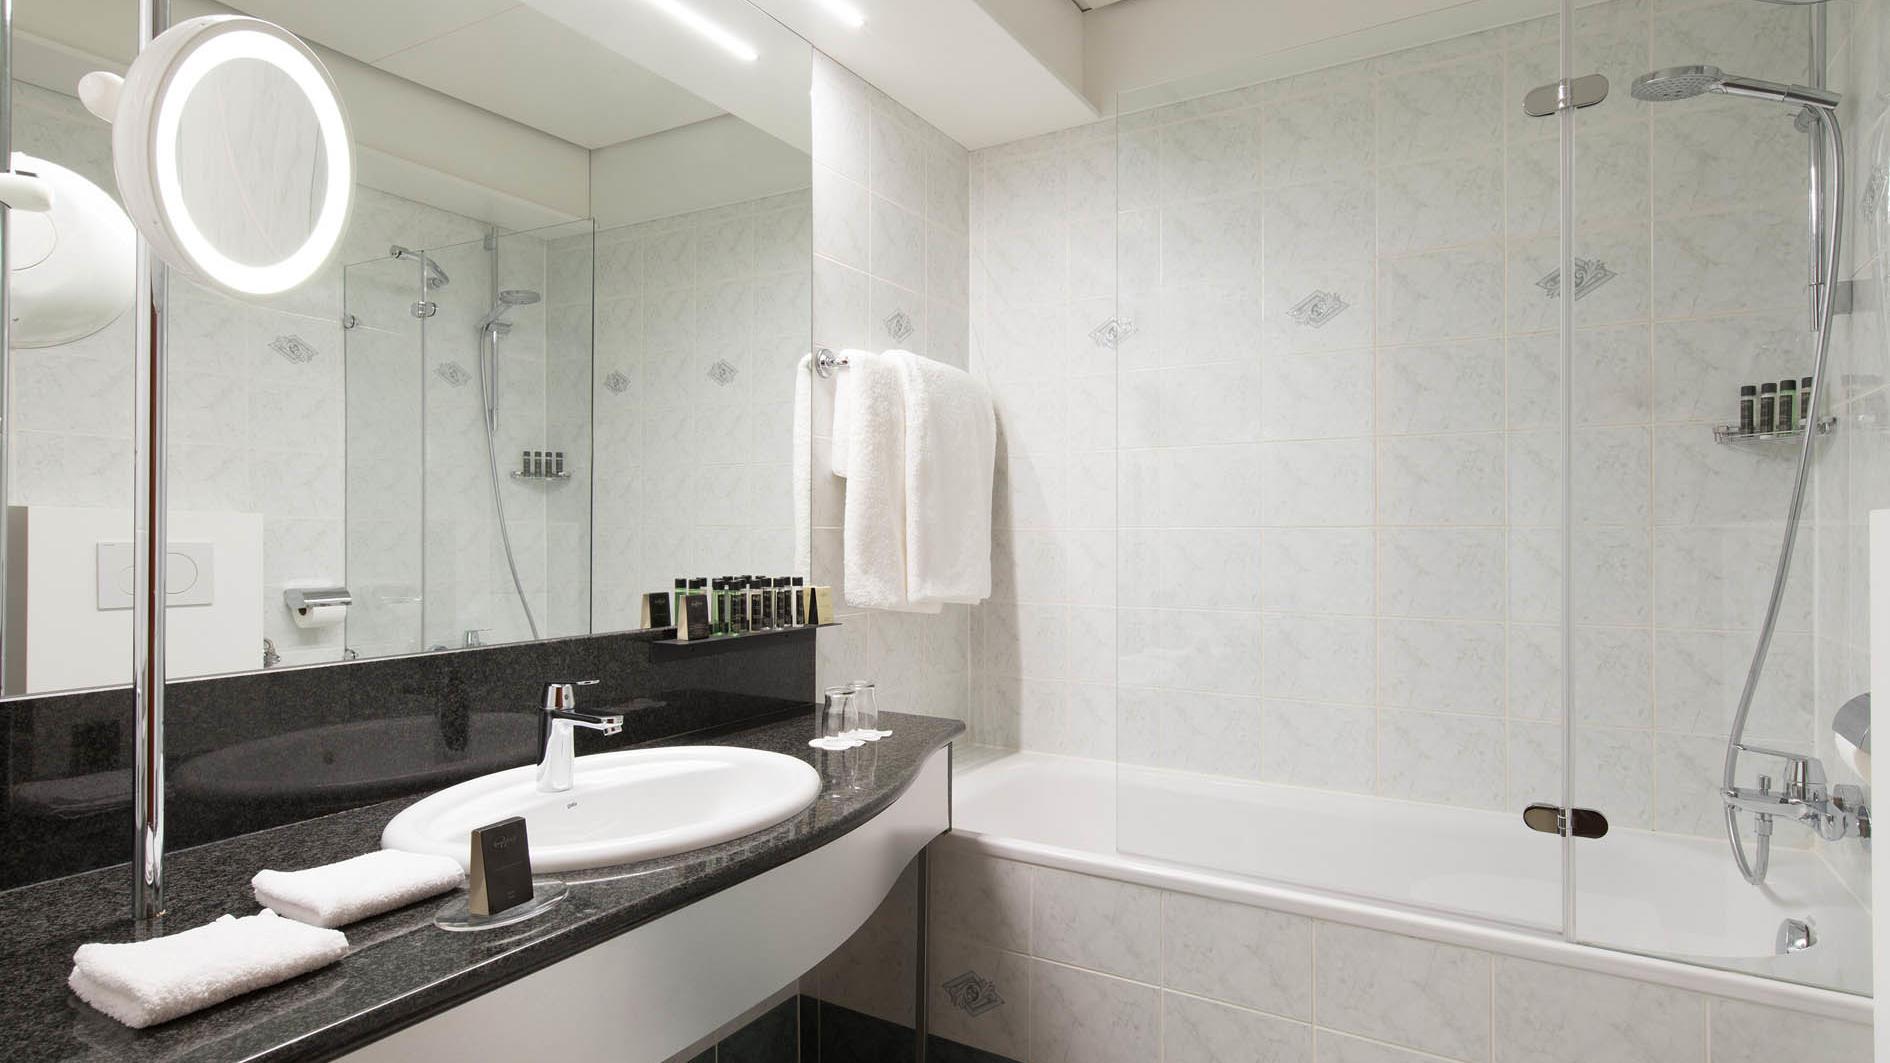 Bathroom at Grand Hotel Union in Ljubljana